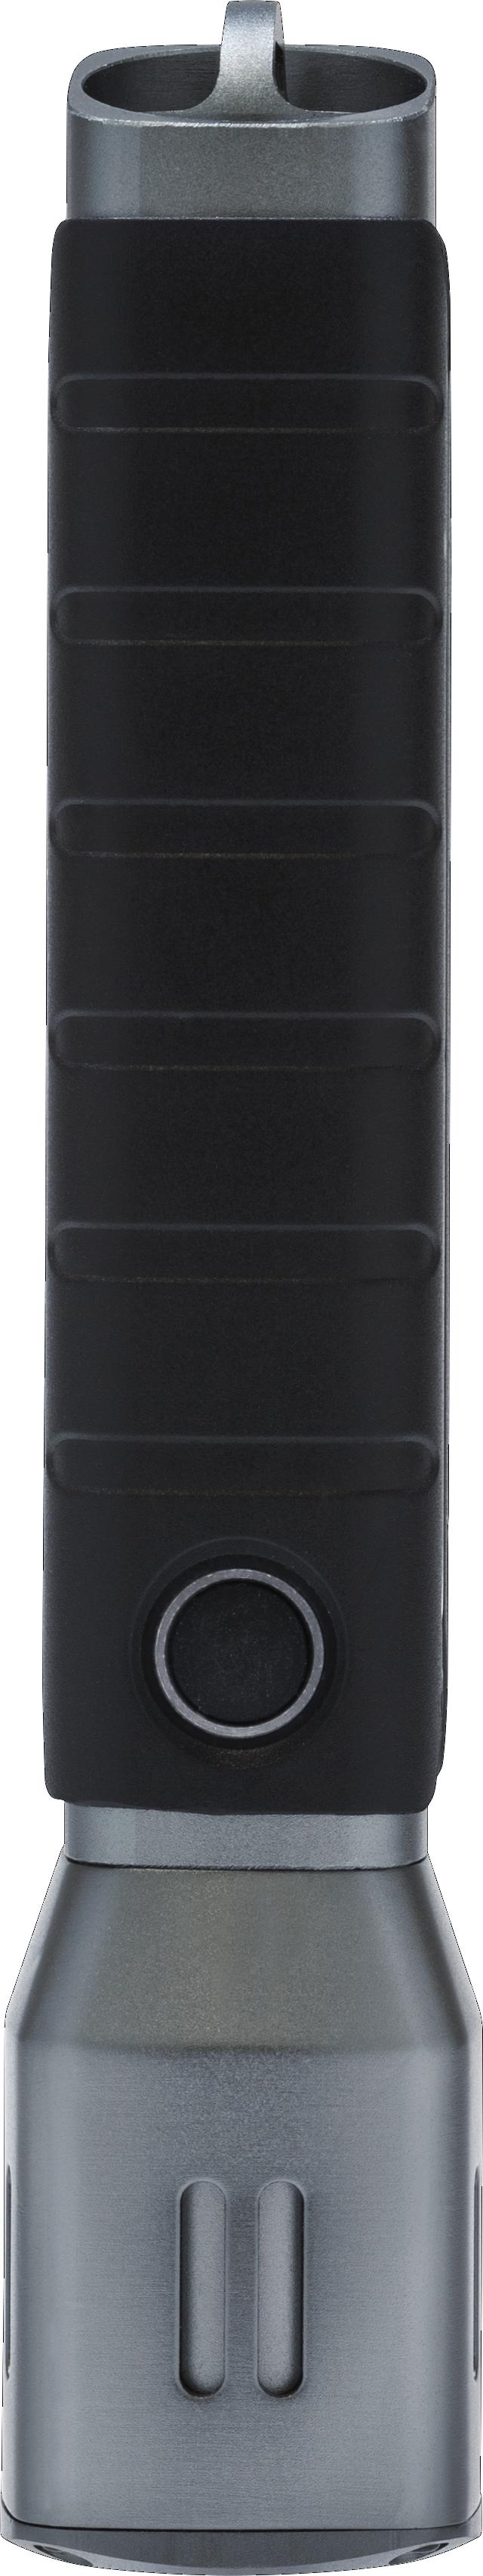 Taschenlampe SecLight TL-517